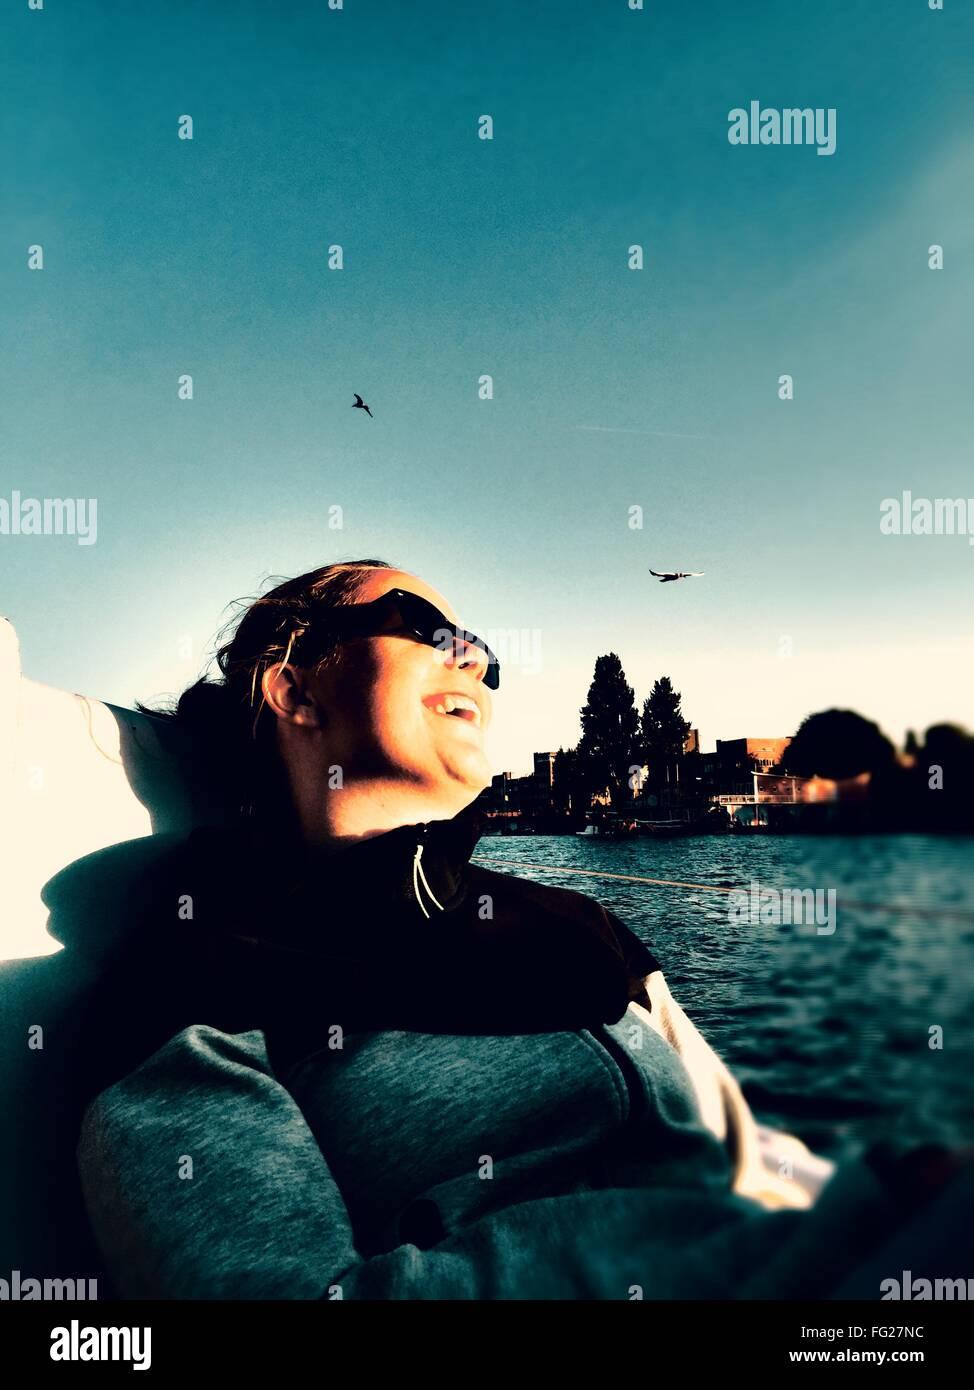 Niedrigen Winkel Ansicht der Frau im Schiff am Fluss Stockbild